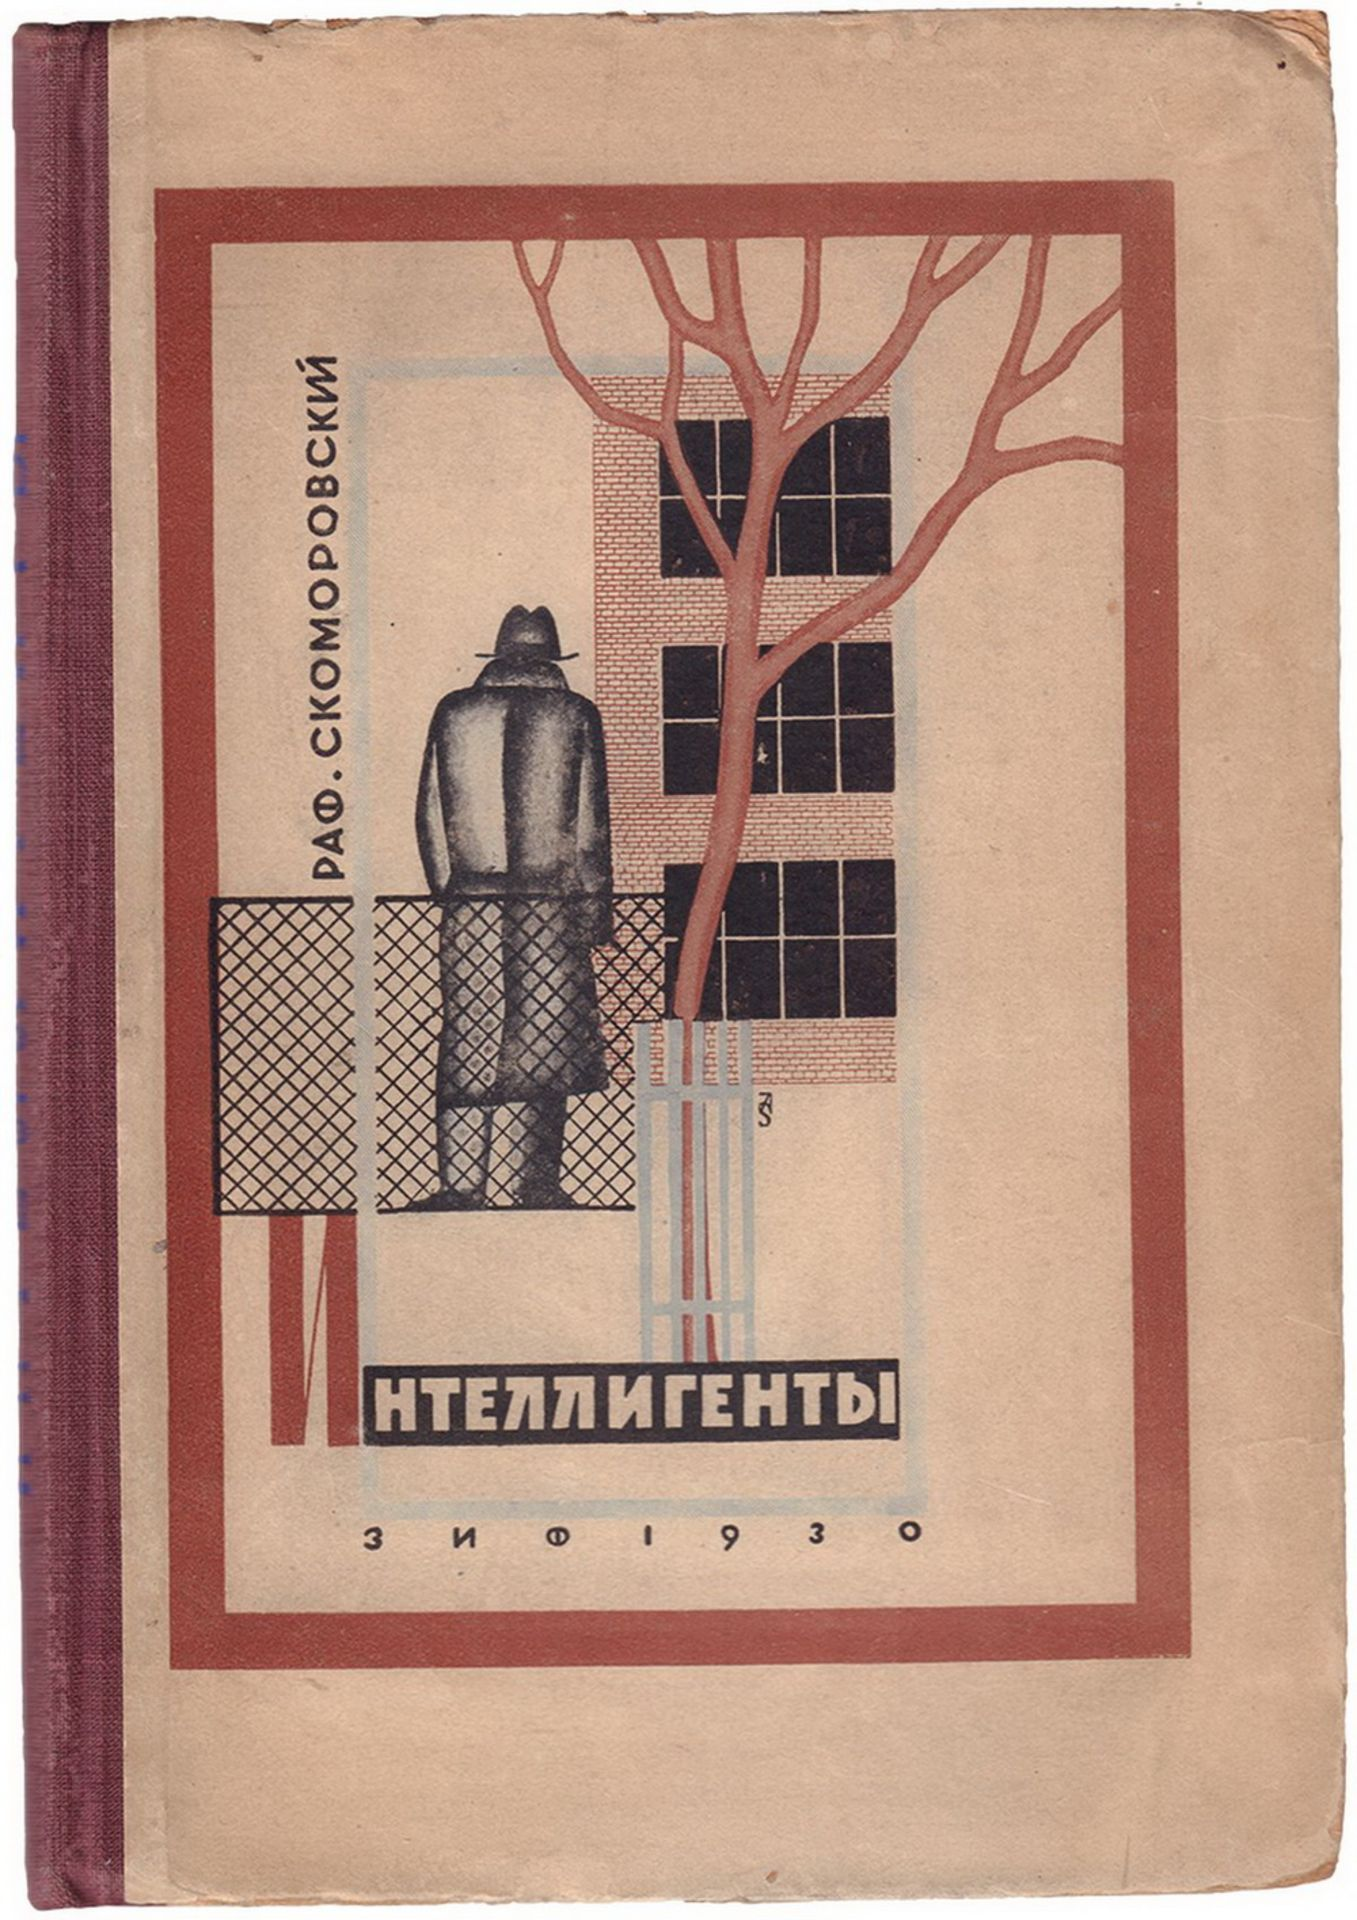 [Surikov, A., design. Soviet art]. Skomorovsky, R.S. Intellectuals: a Novel. - Moscow; Leningrad, 19